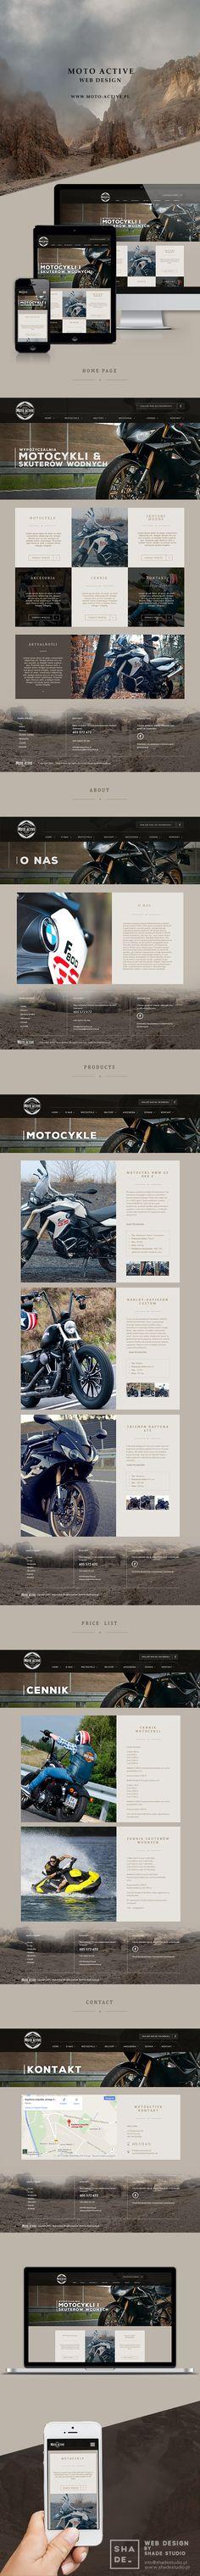 Moto Active Web Design